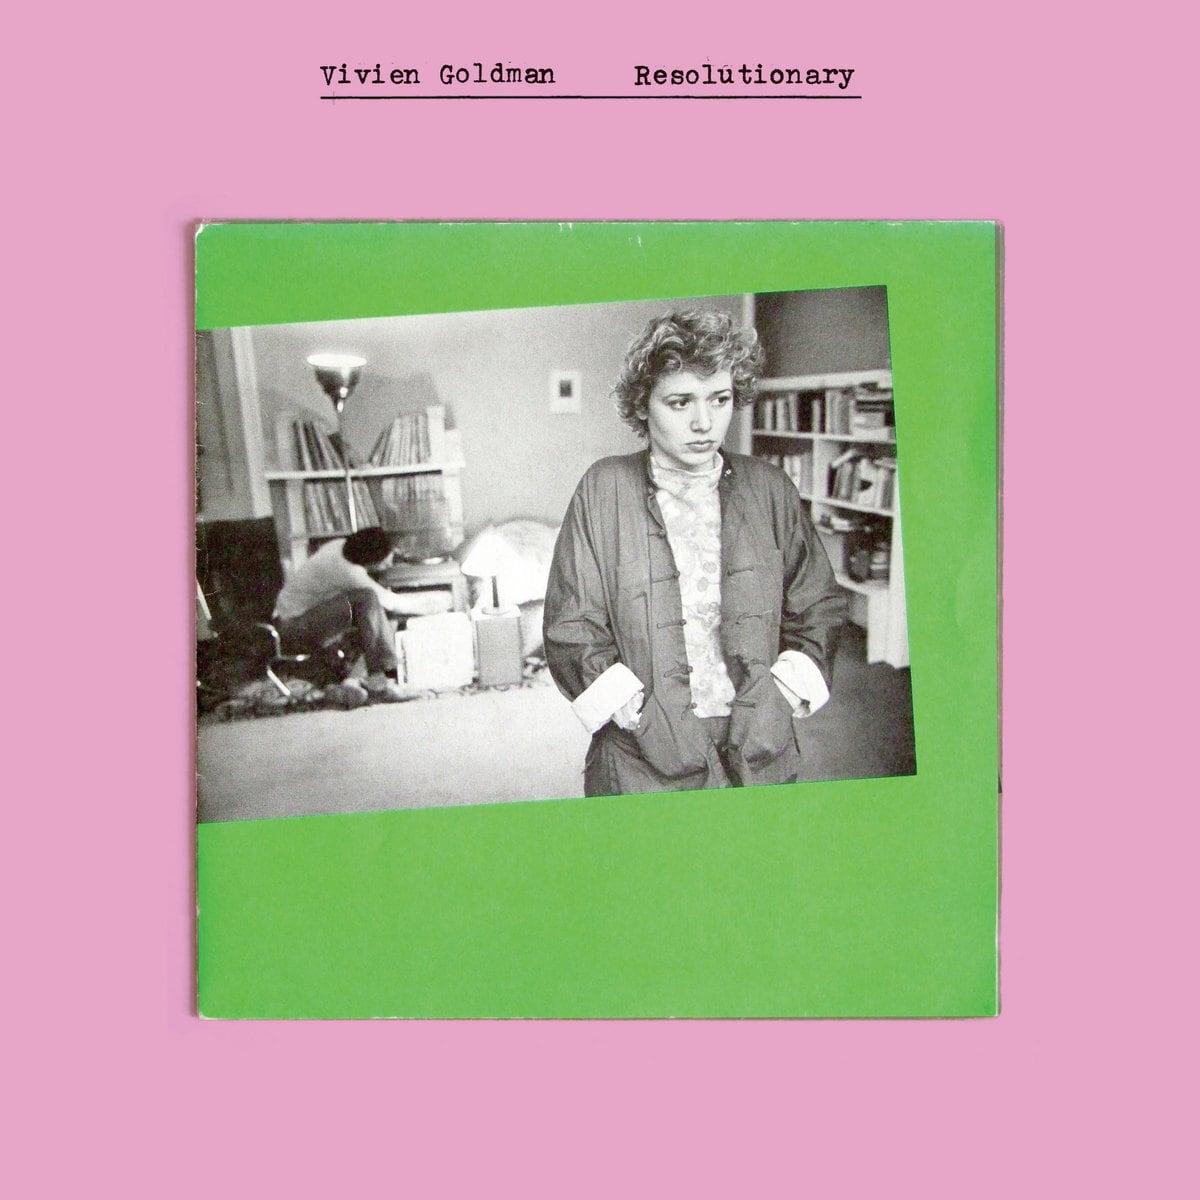 Vivien Goldman - Resolutionary (Songs 1979-1982) (LP)